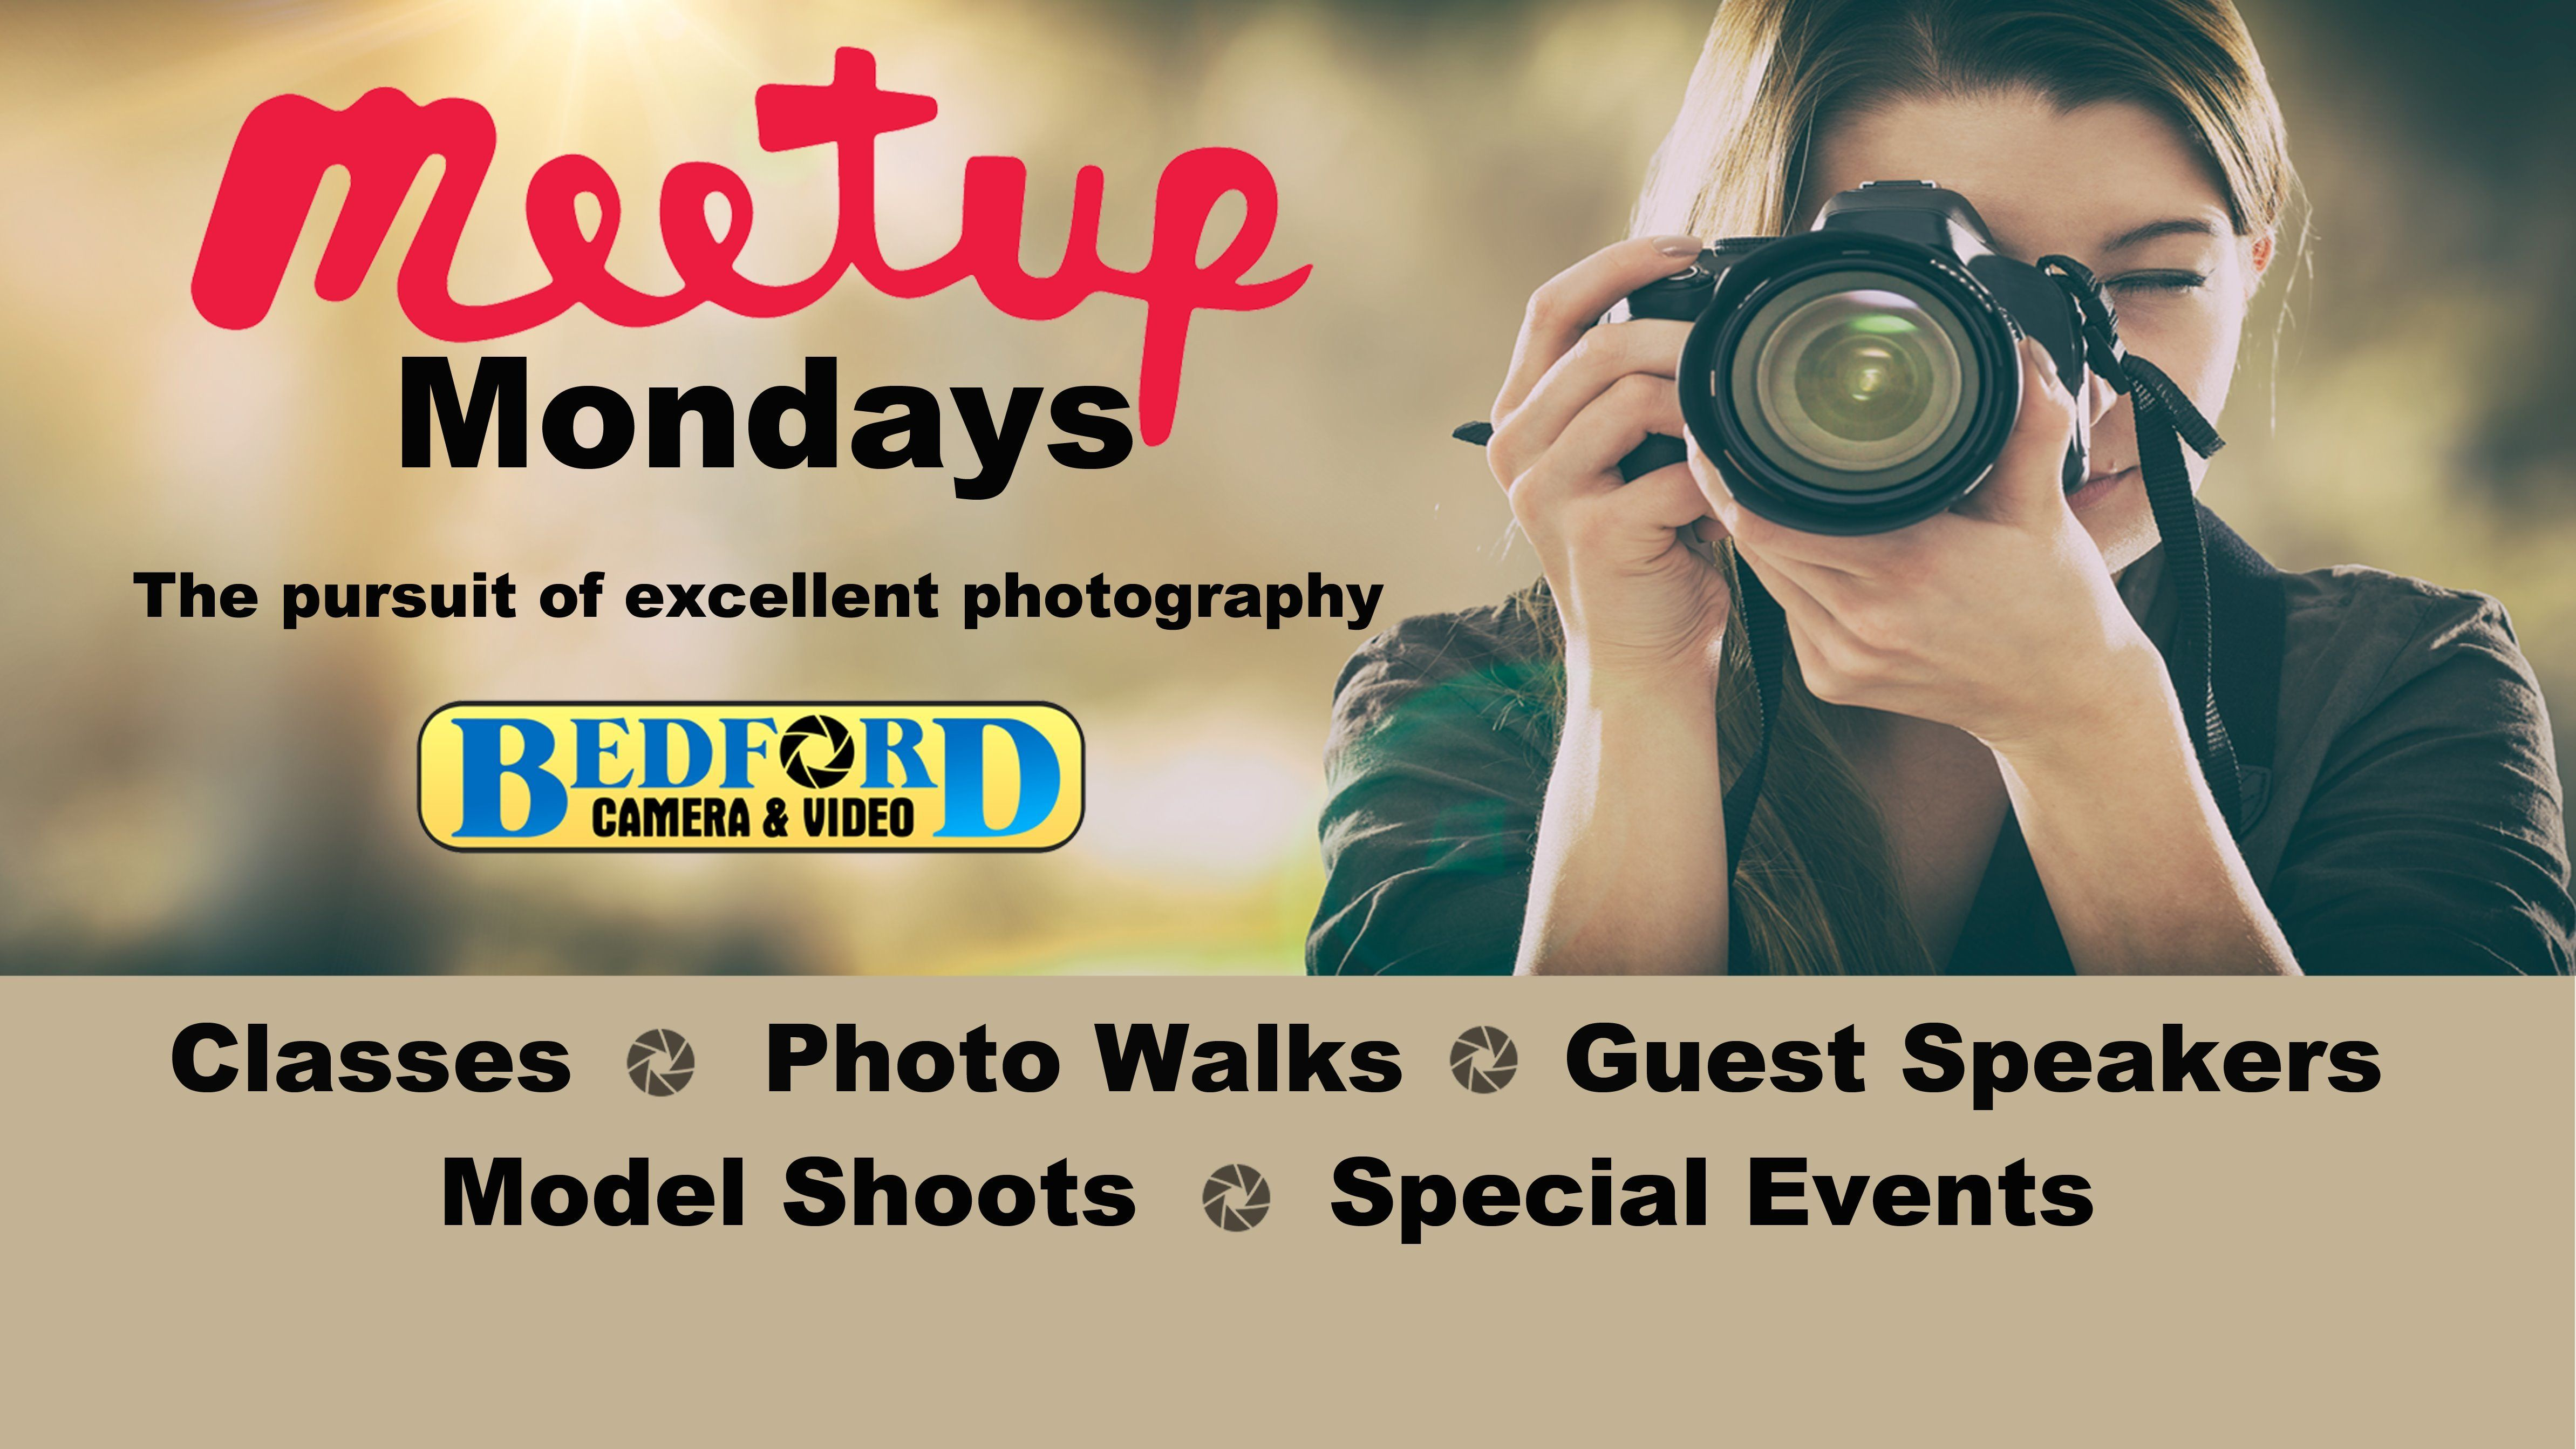 Bedford Camera's Meetup Monday Photography Fun